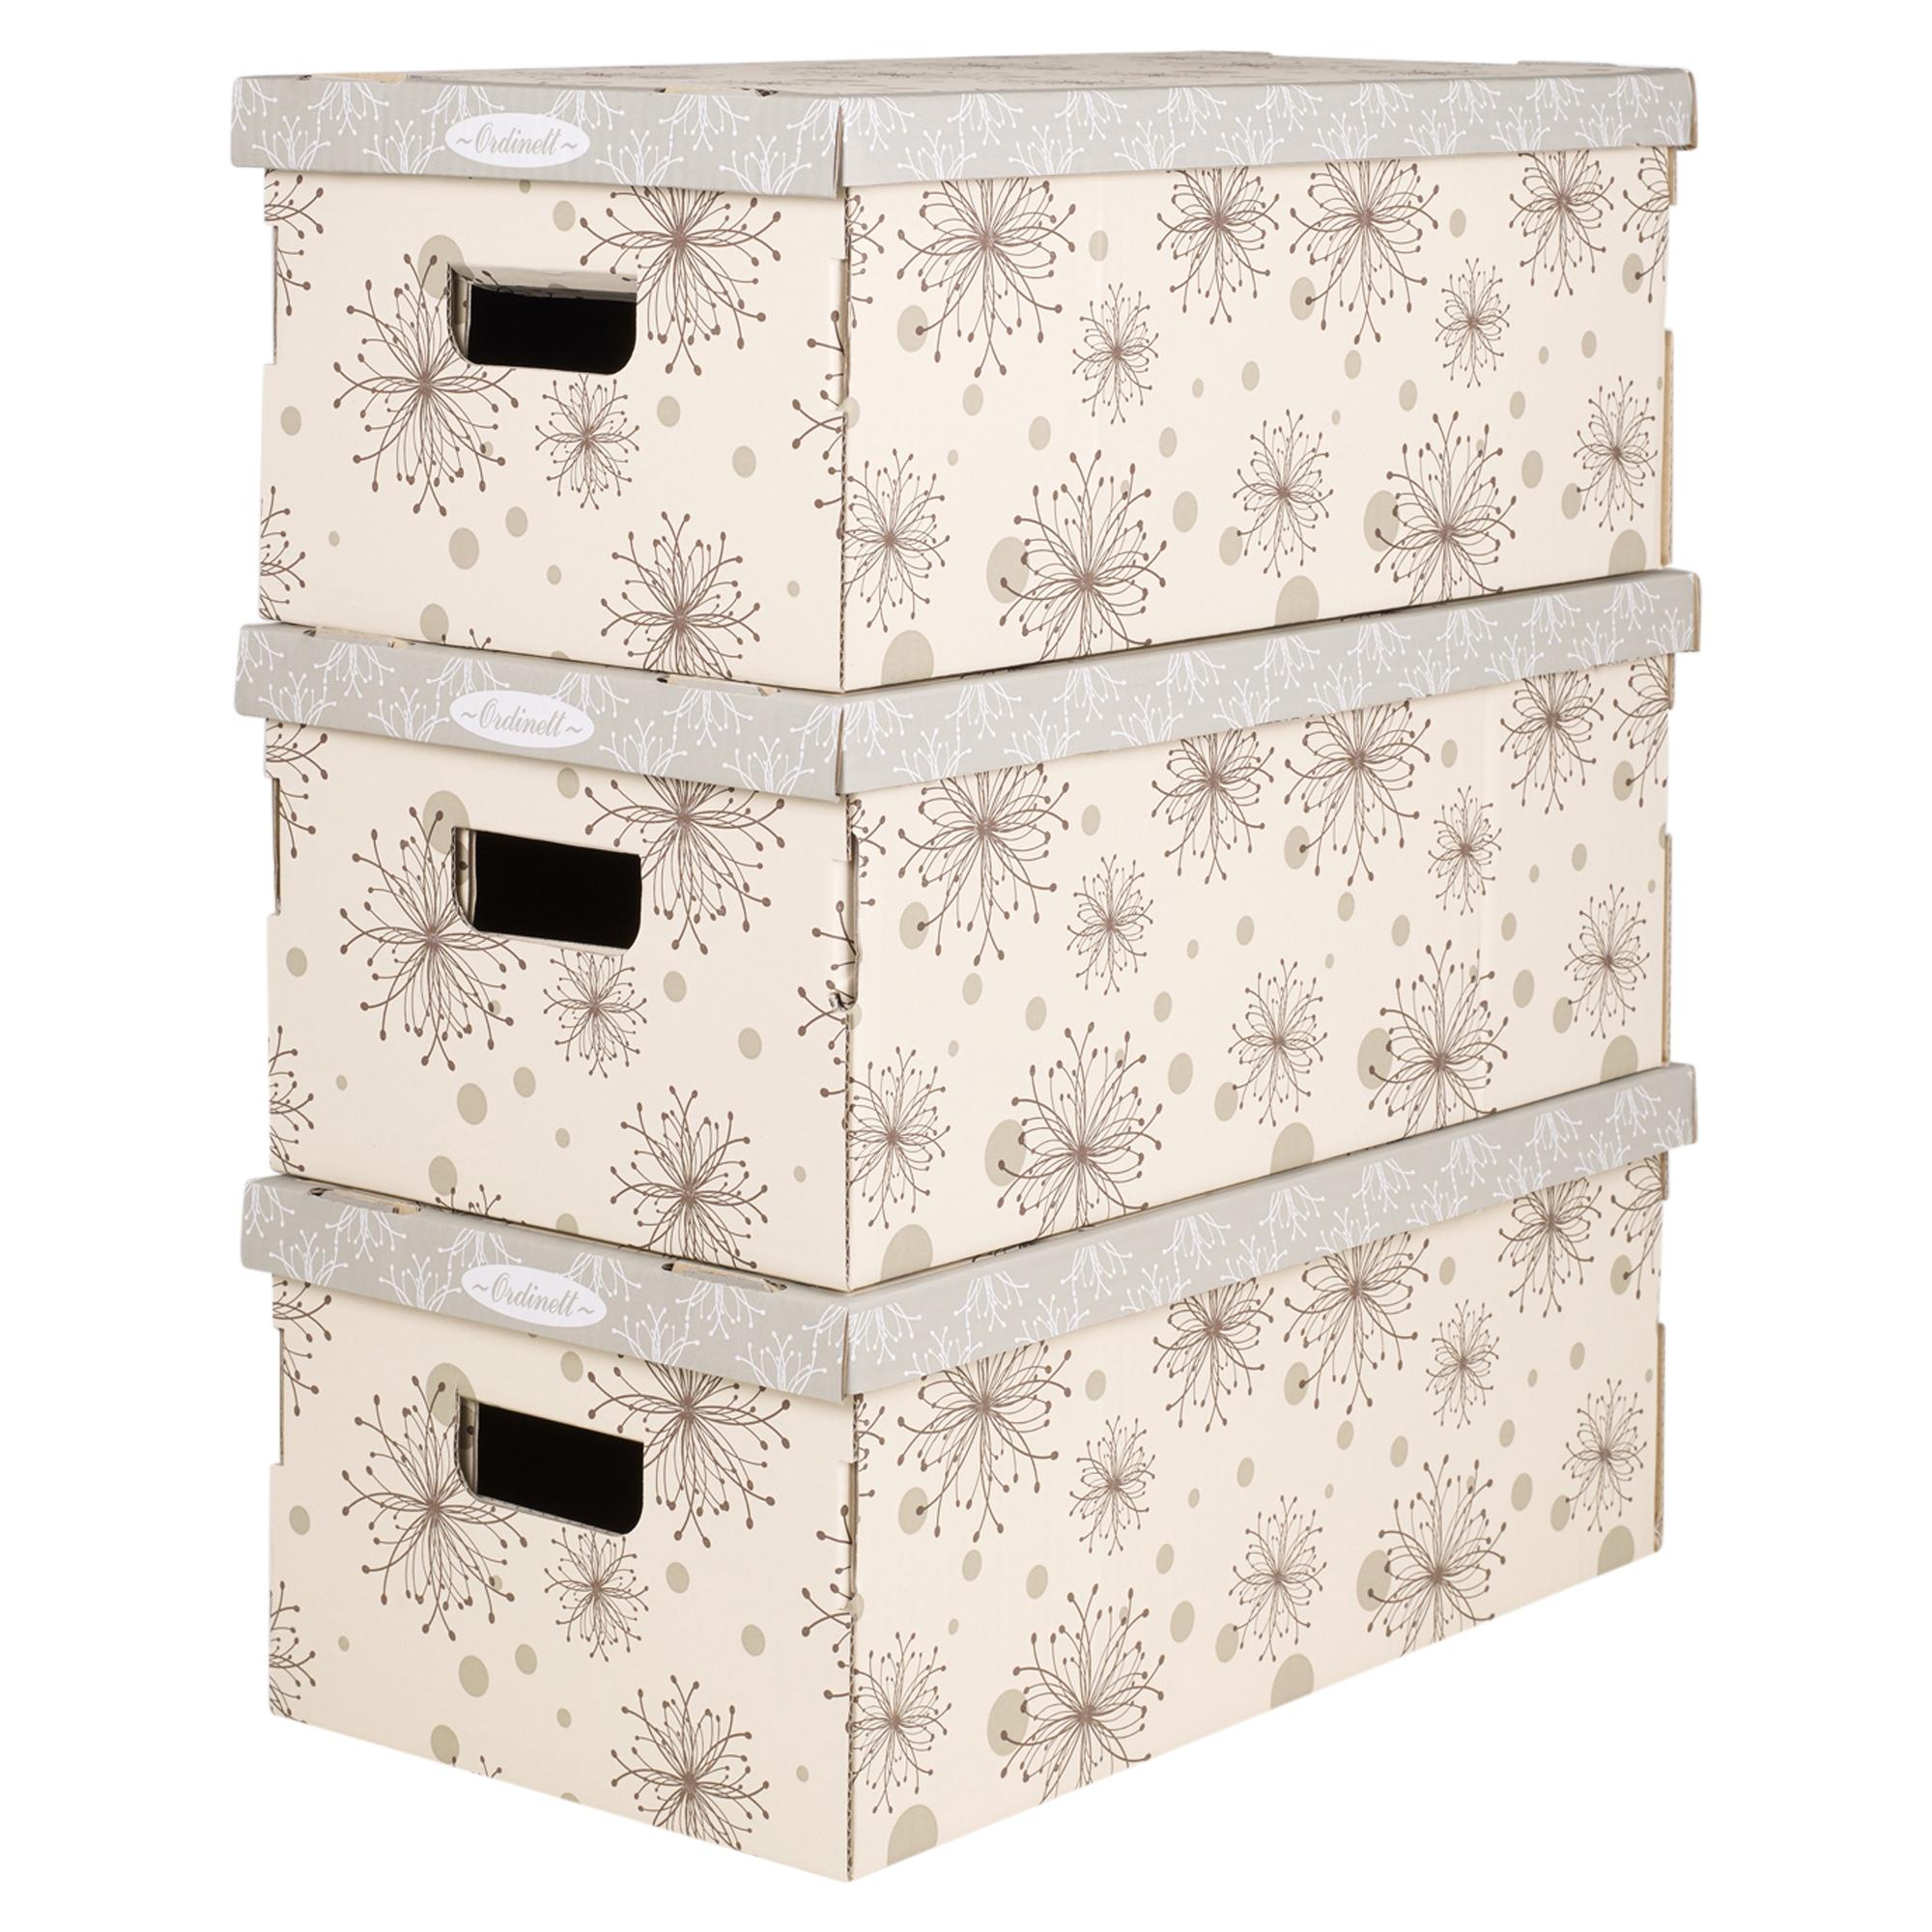 Juego de 3 cart n cajas almacenaje con asas apilables for Cajas carton almacenaje